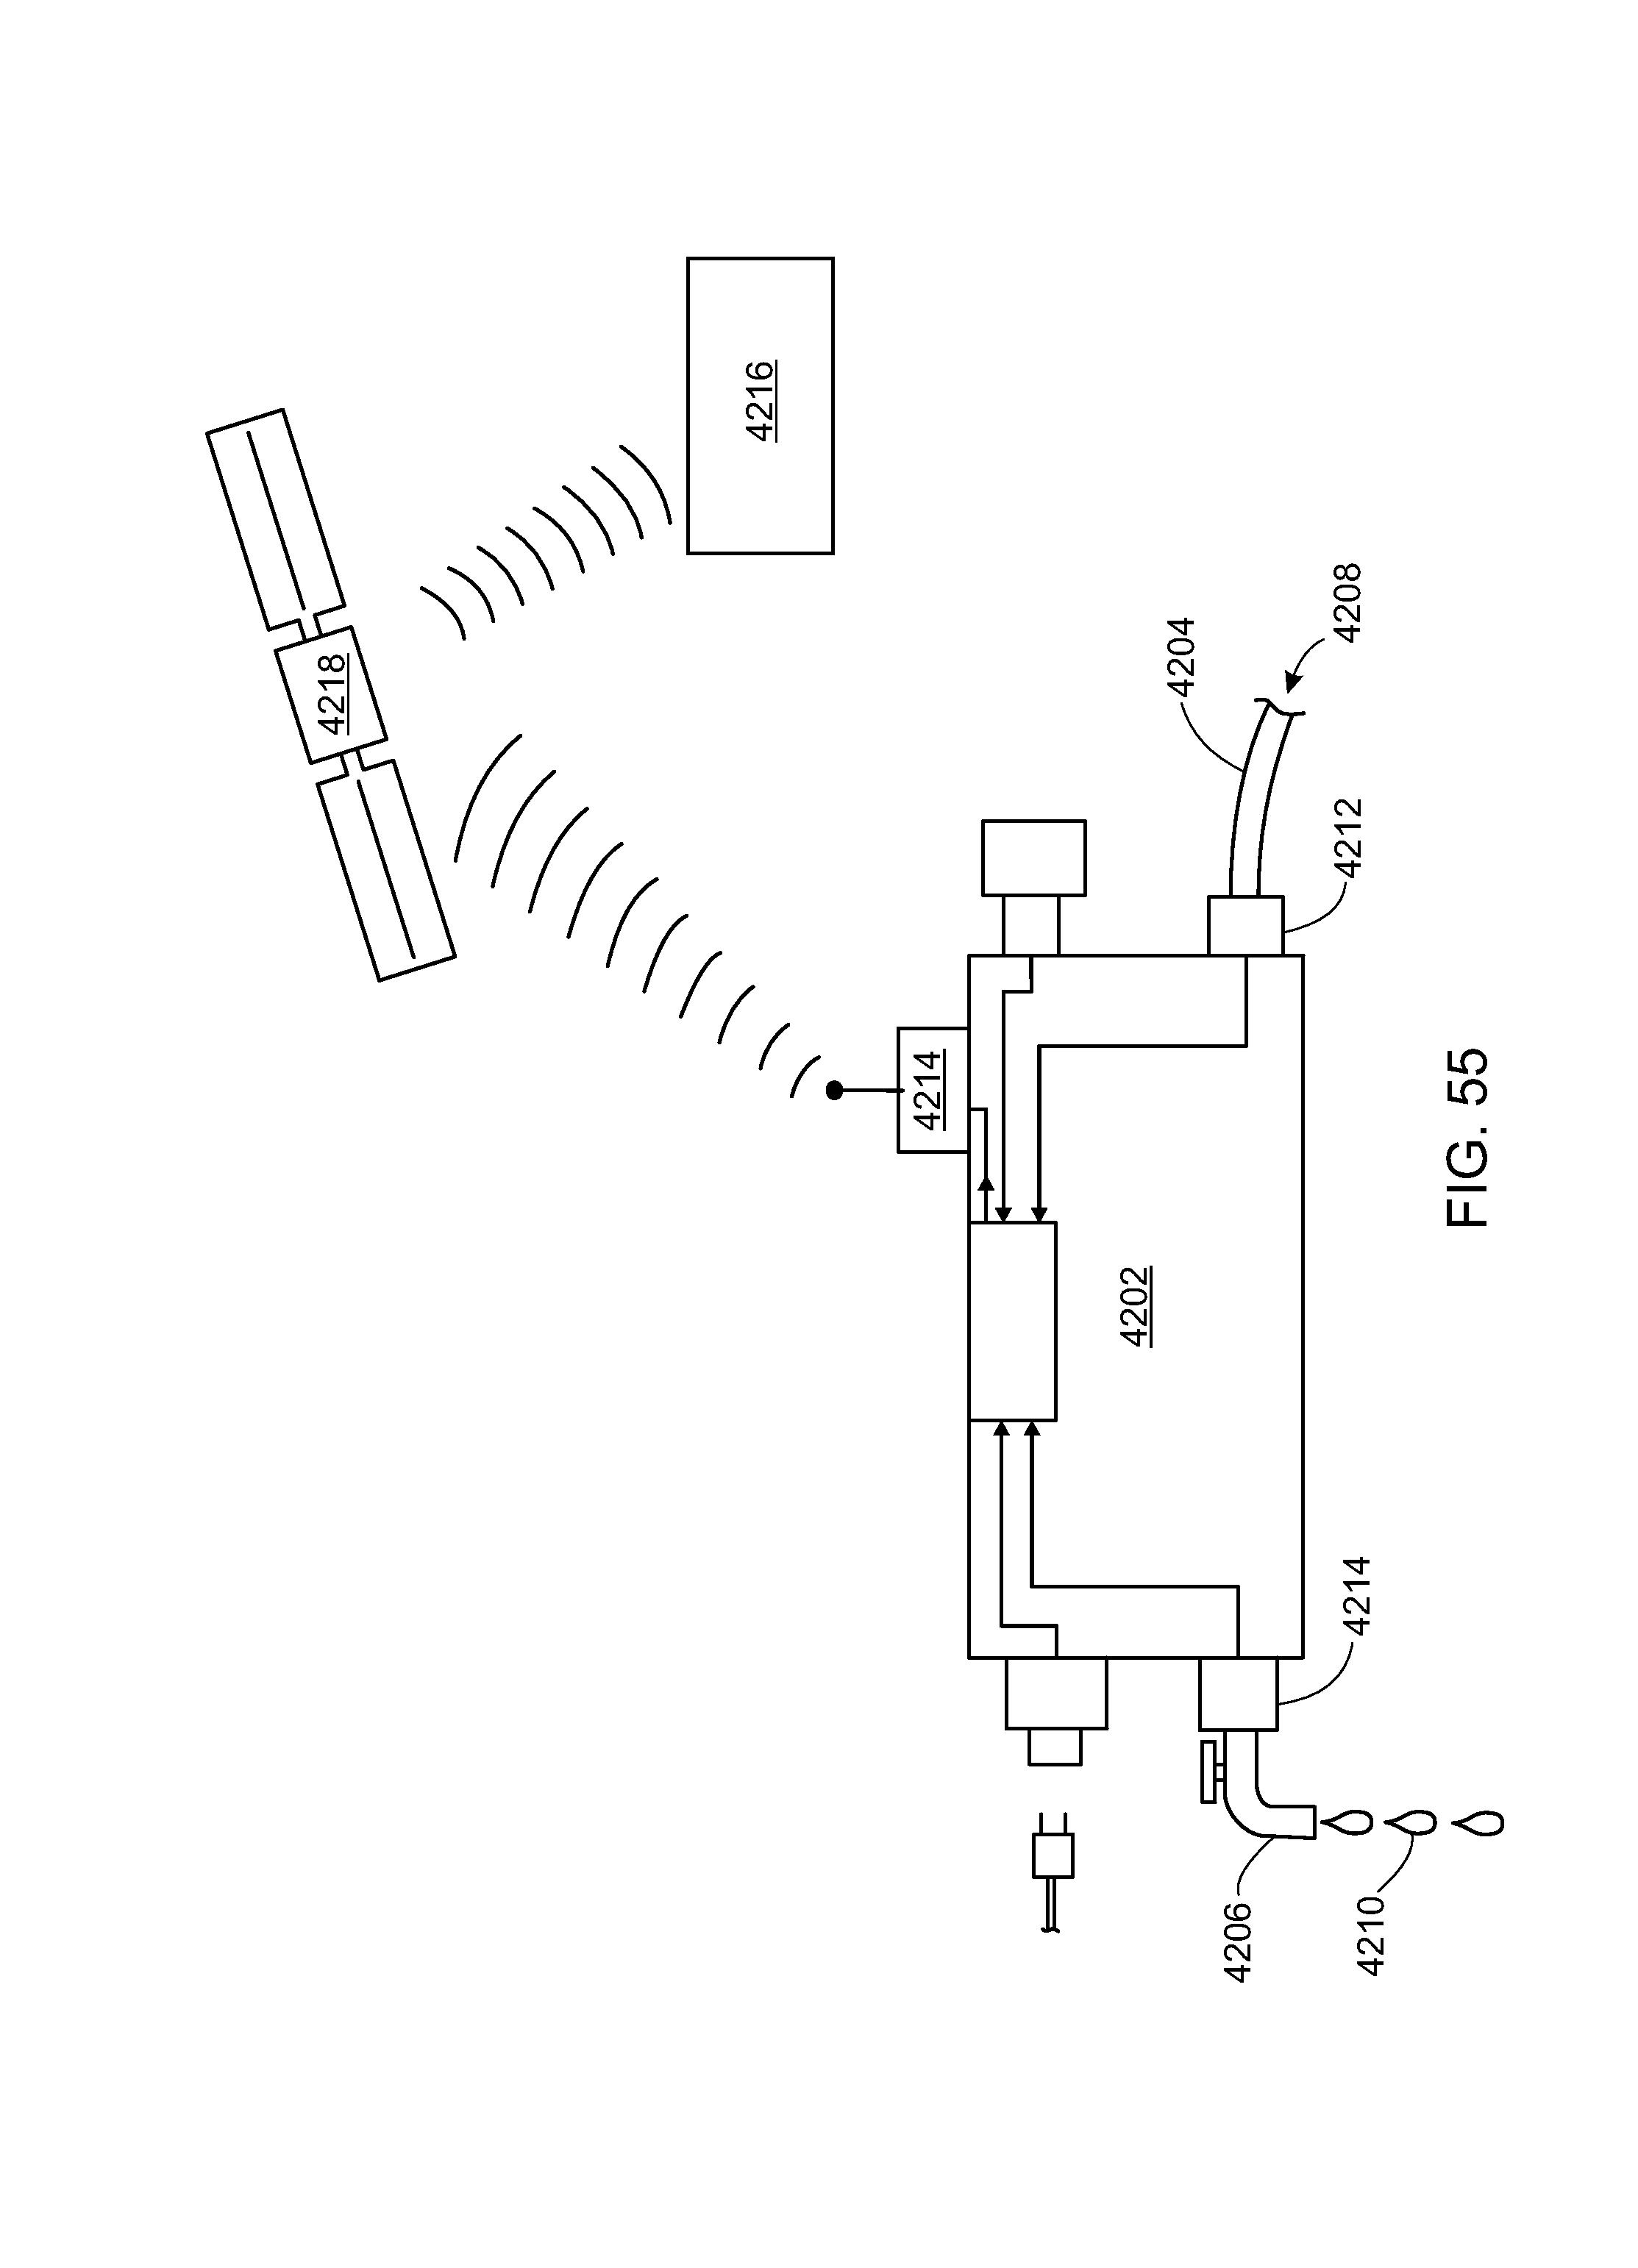 Patent US 8,359,877 B2 on